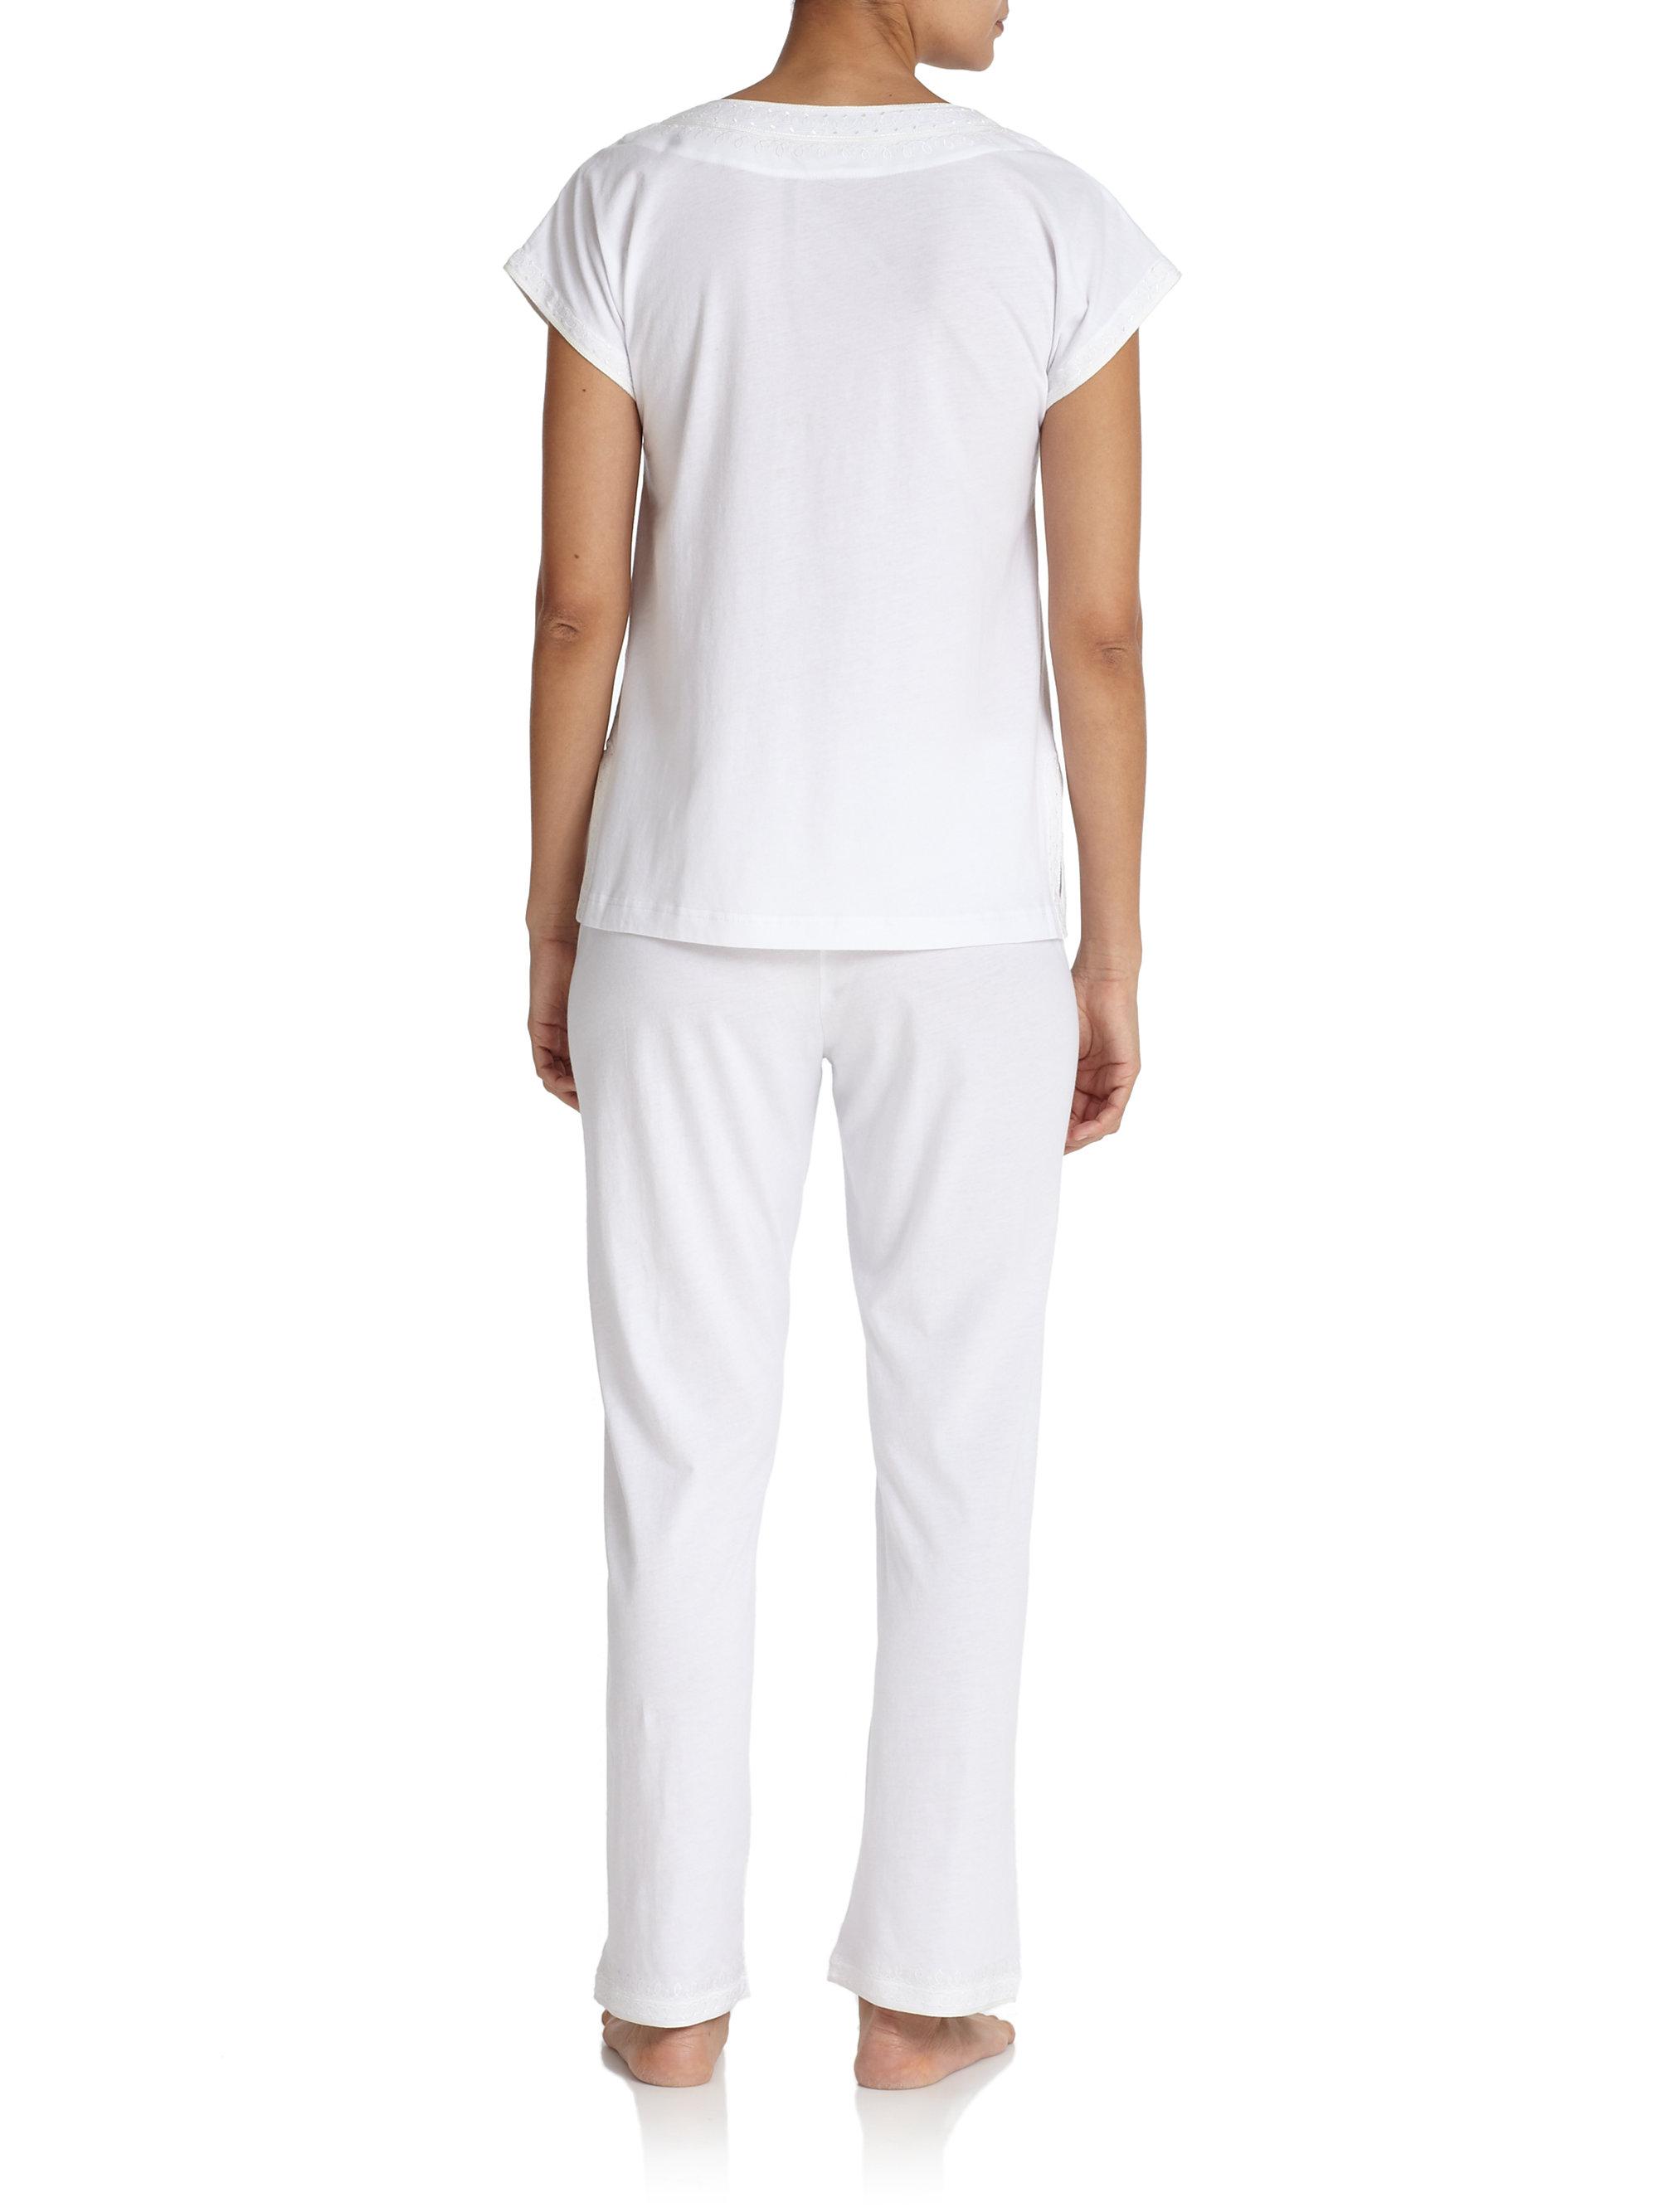 lyst oscar de la renta soft scroll pima cotton pajamas in white. Black Bedroom Furniture Sets. Home Design Ideas